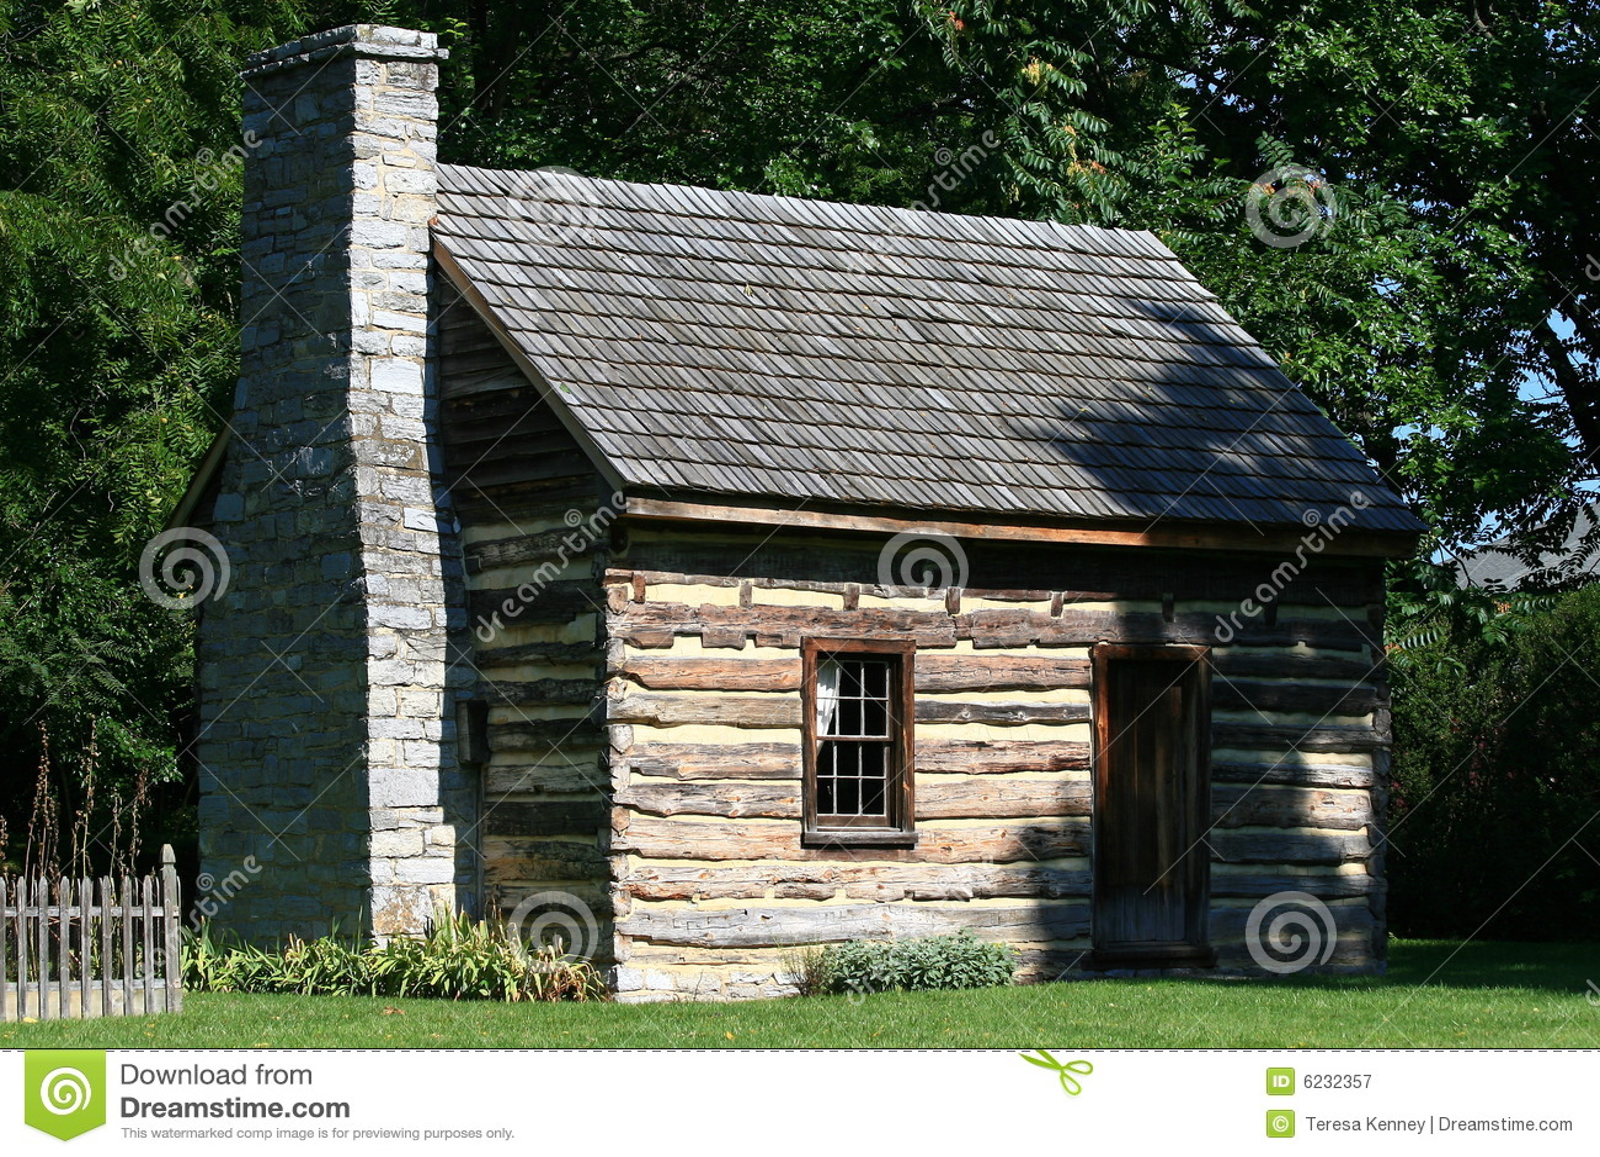 Log cabin royalty free stock image for Free log cabin